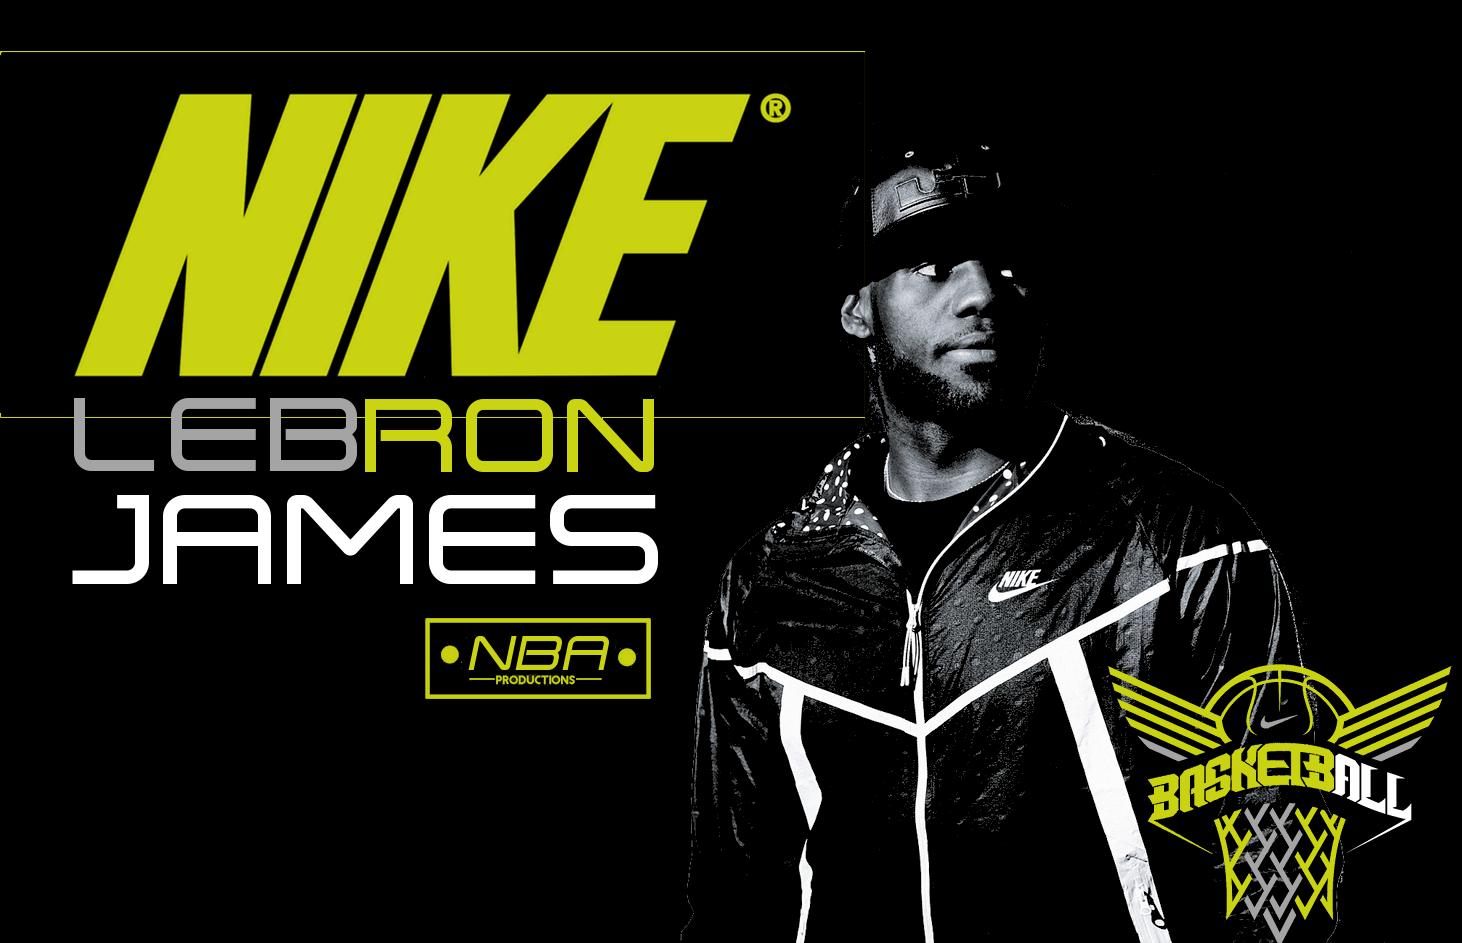 Nike Schuhe, Turnschuhe Trends & herren & Damenbekleidung